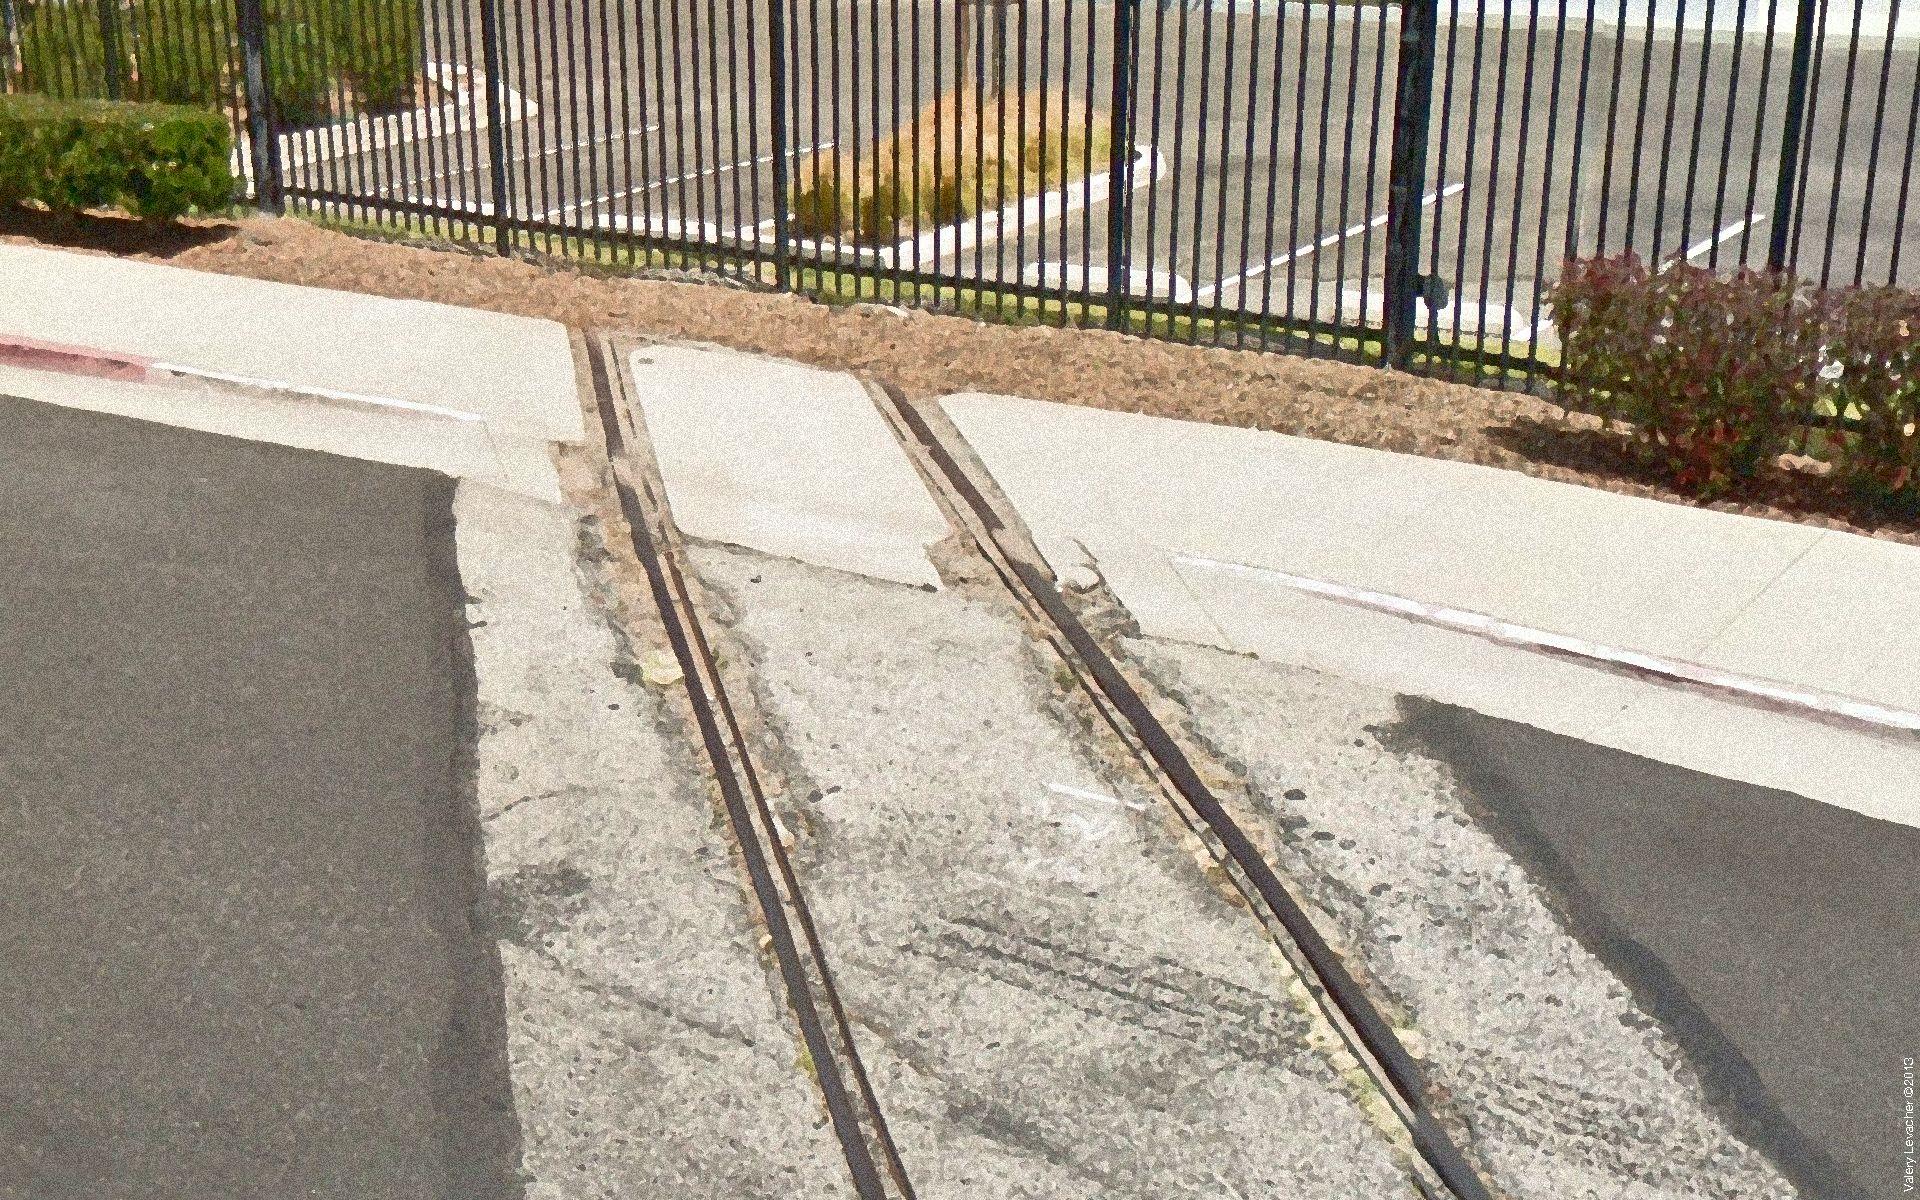 Hawthorne Drift Day 28 / Last Train Before Line Closure [3]